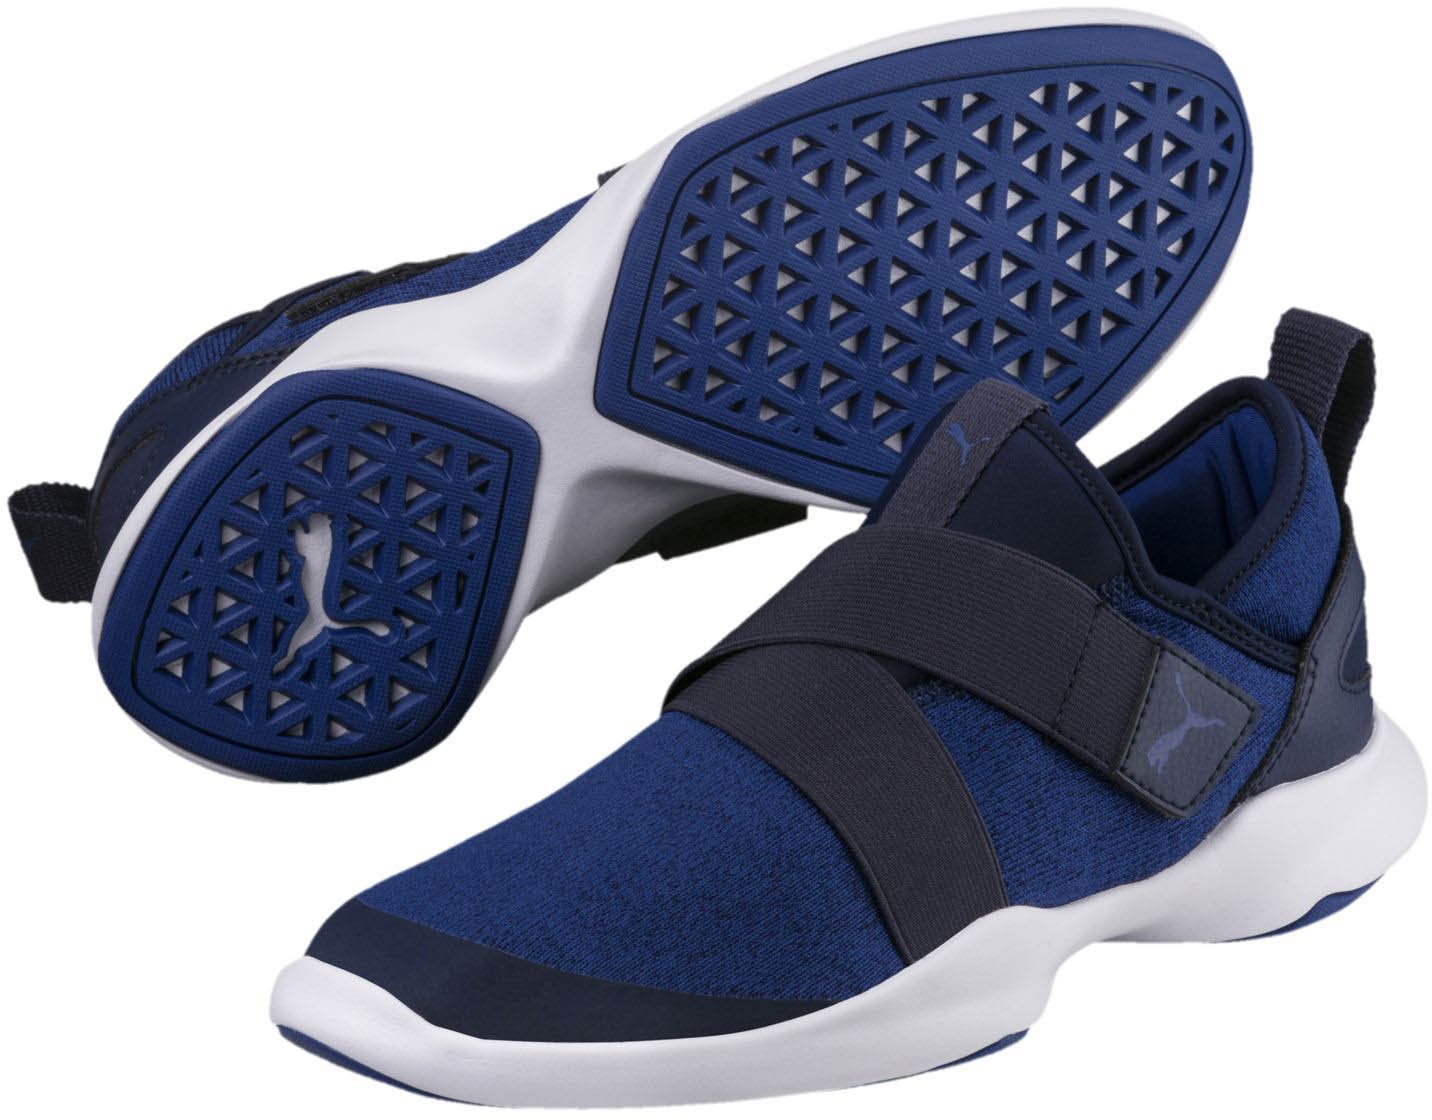 PUMA Women's Dare Ac Sneaker B077SYFG3P 6 M US|Peacoat-sodalite Blue